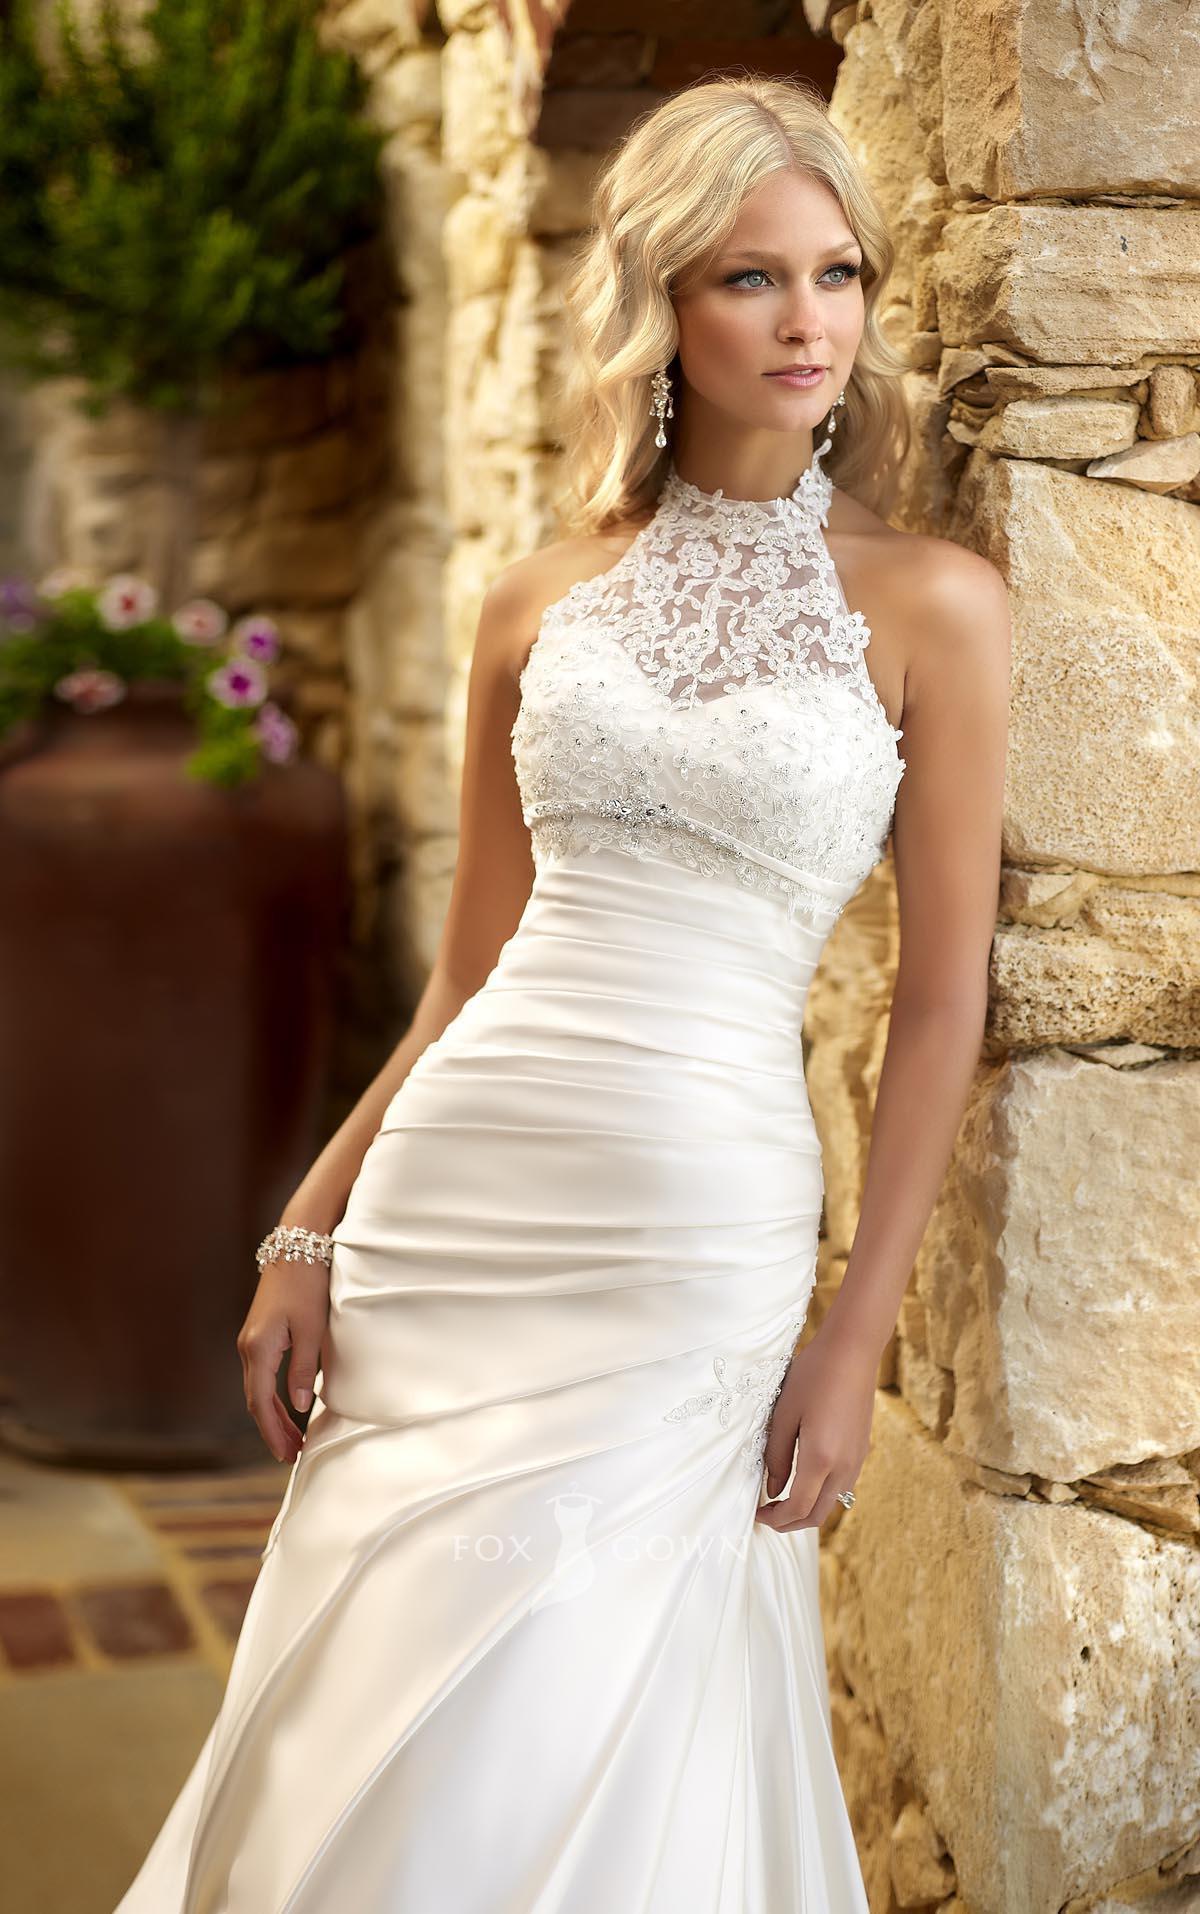 Lace Wedding Gowns  Ten Beautiful Lace Wedding Dresses – BestBride101